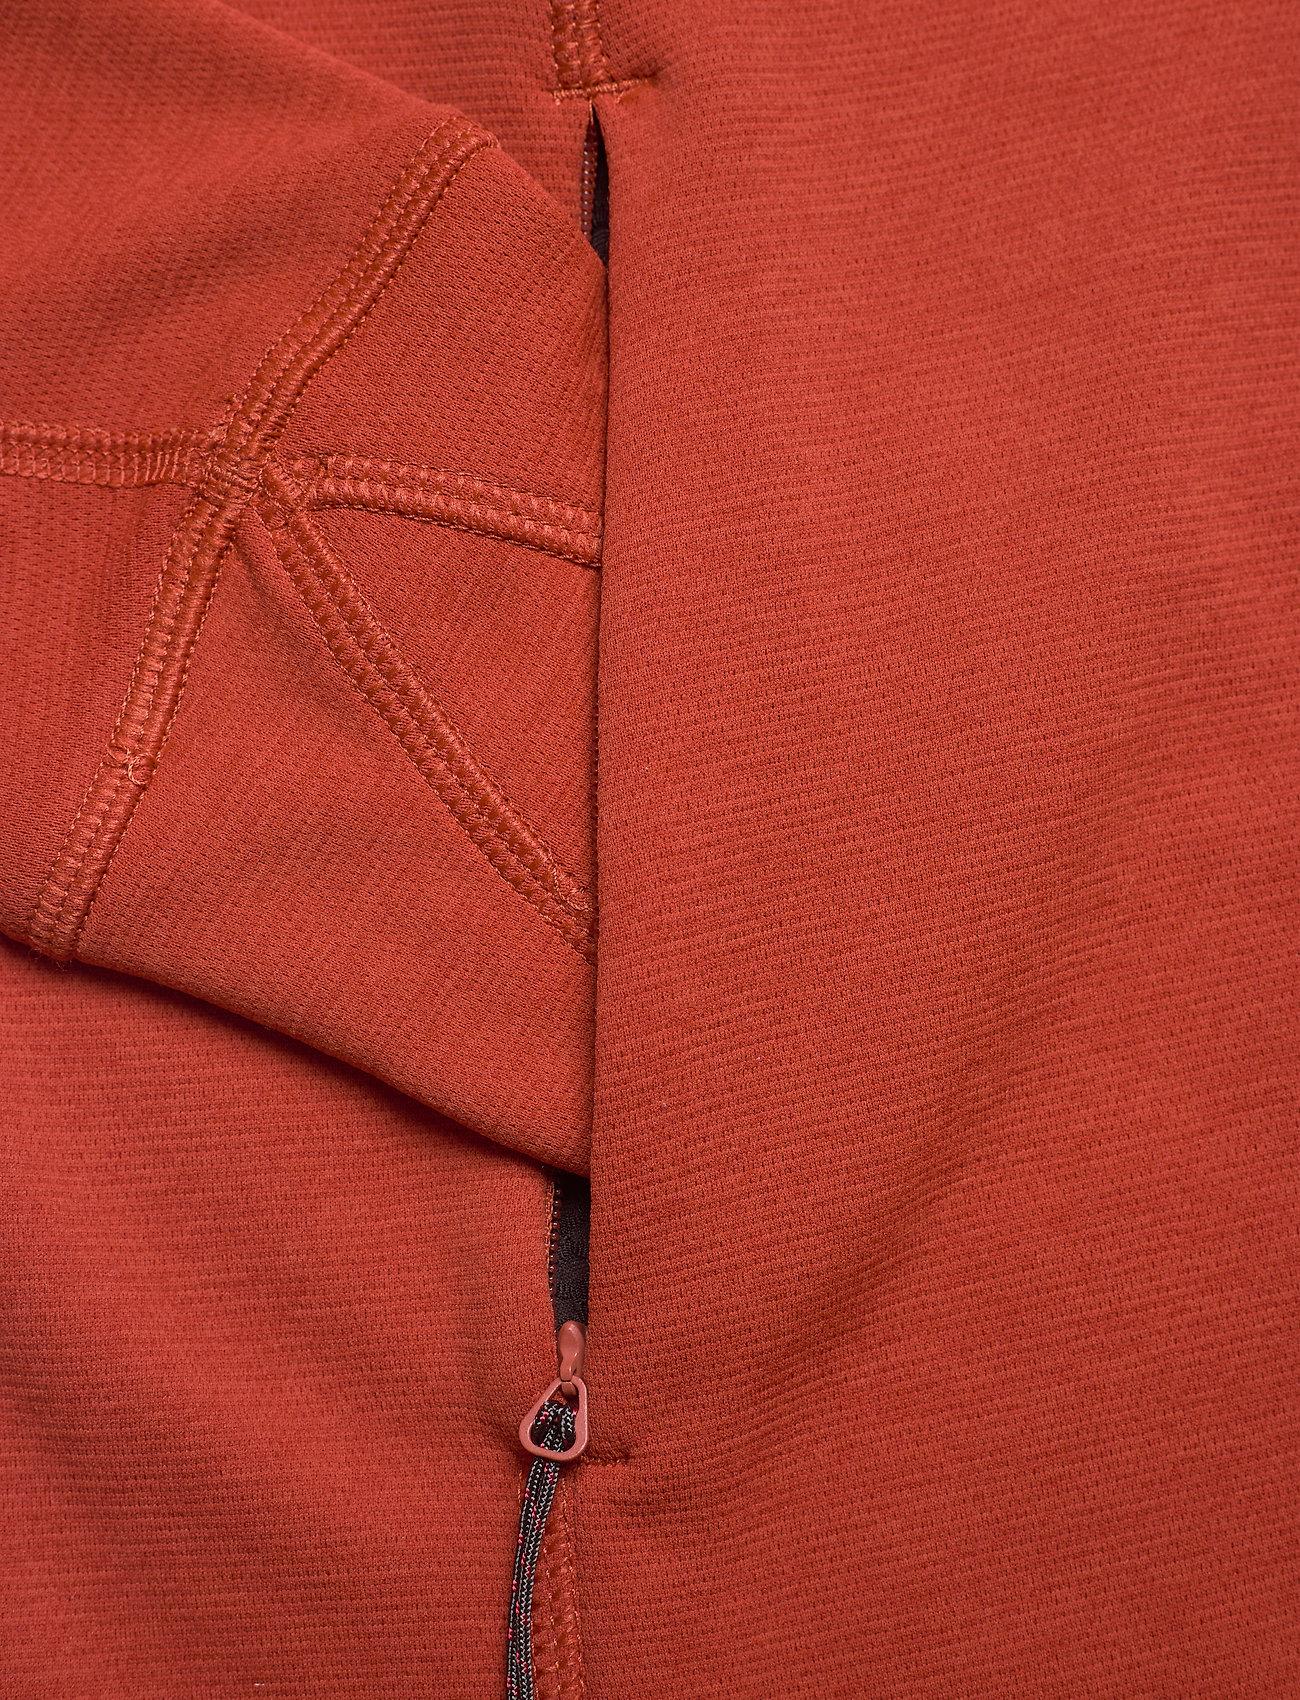 Klättermusen - Njorun 2.0 Hoodie W's - sweatshirts & hoodies - dark redwood - 3